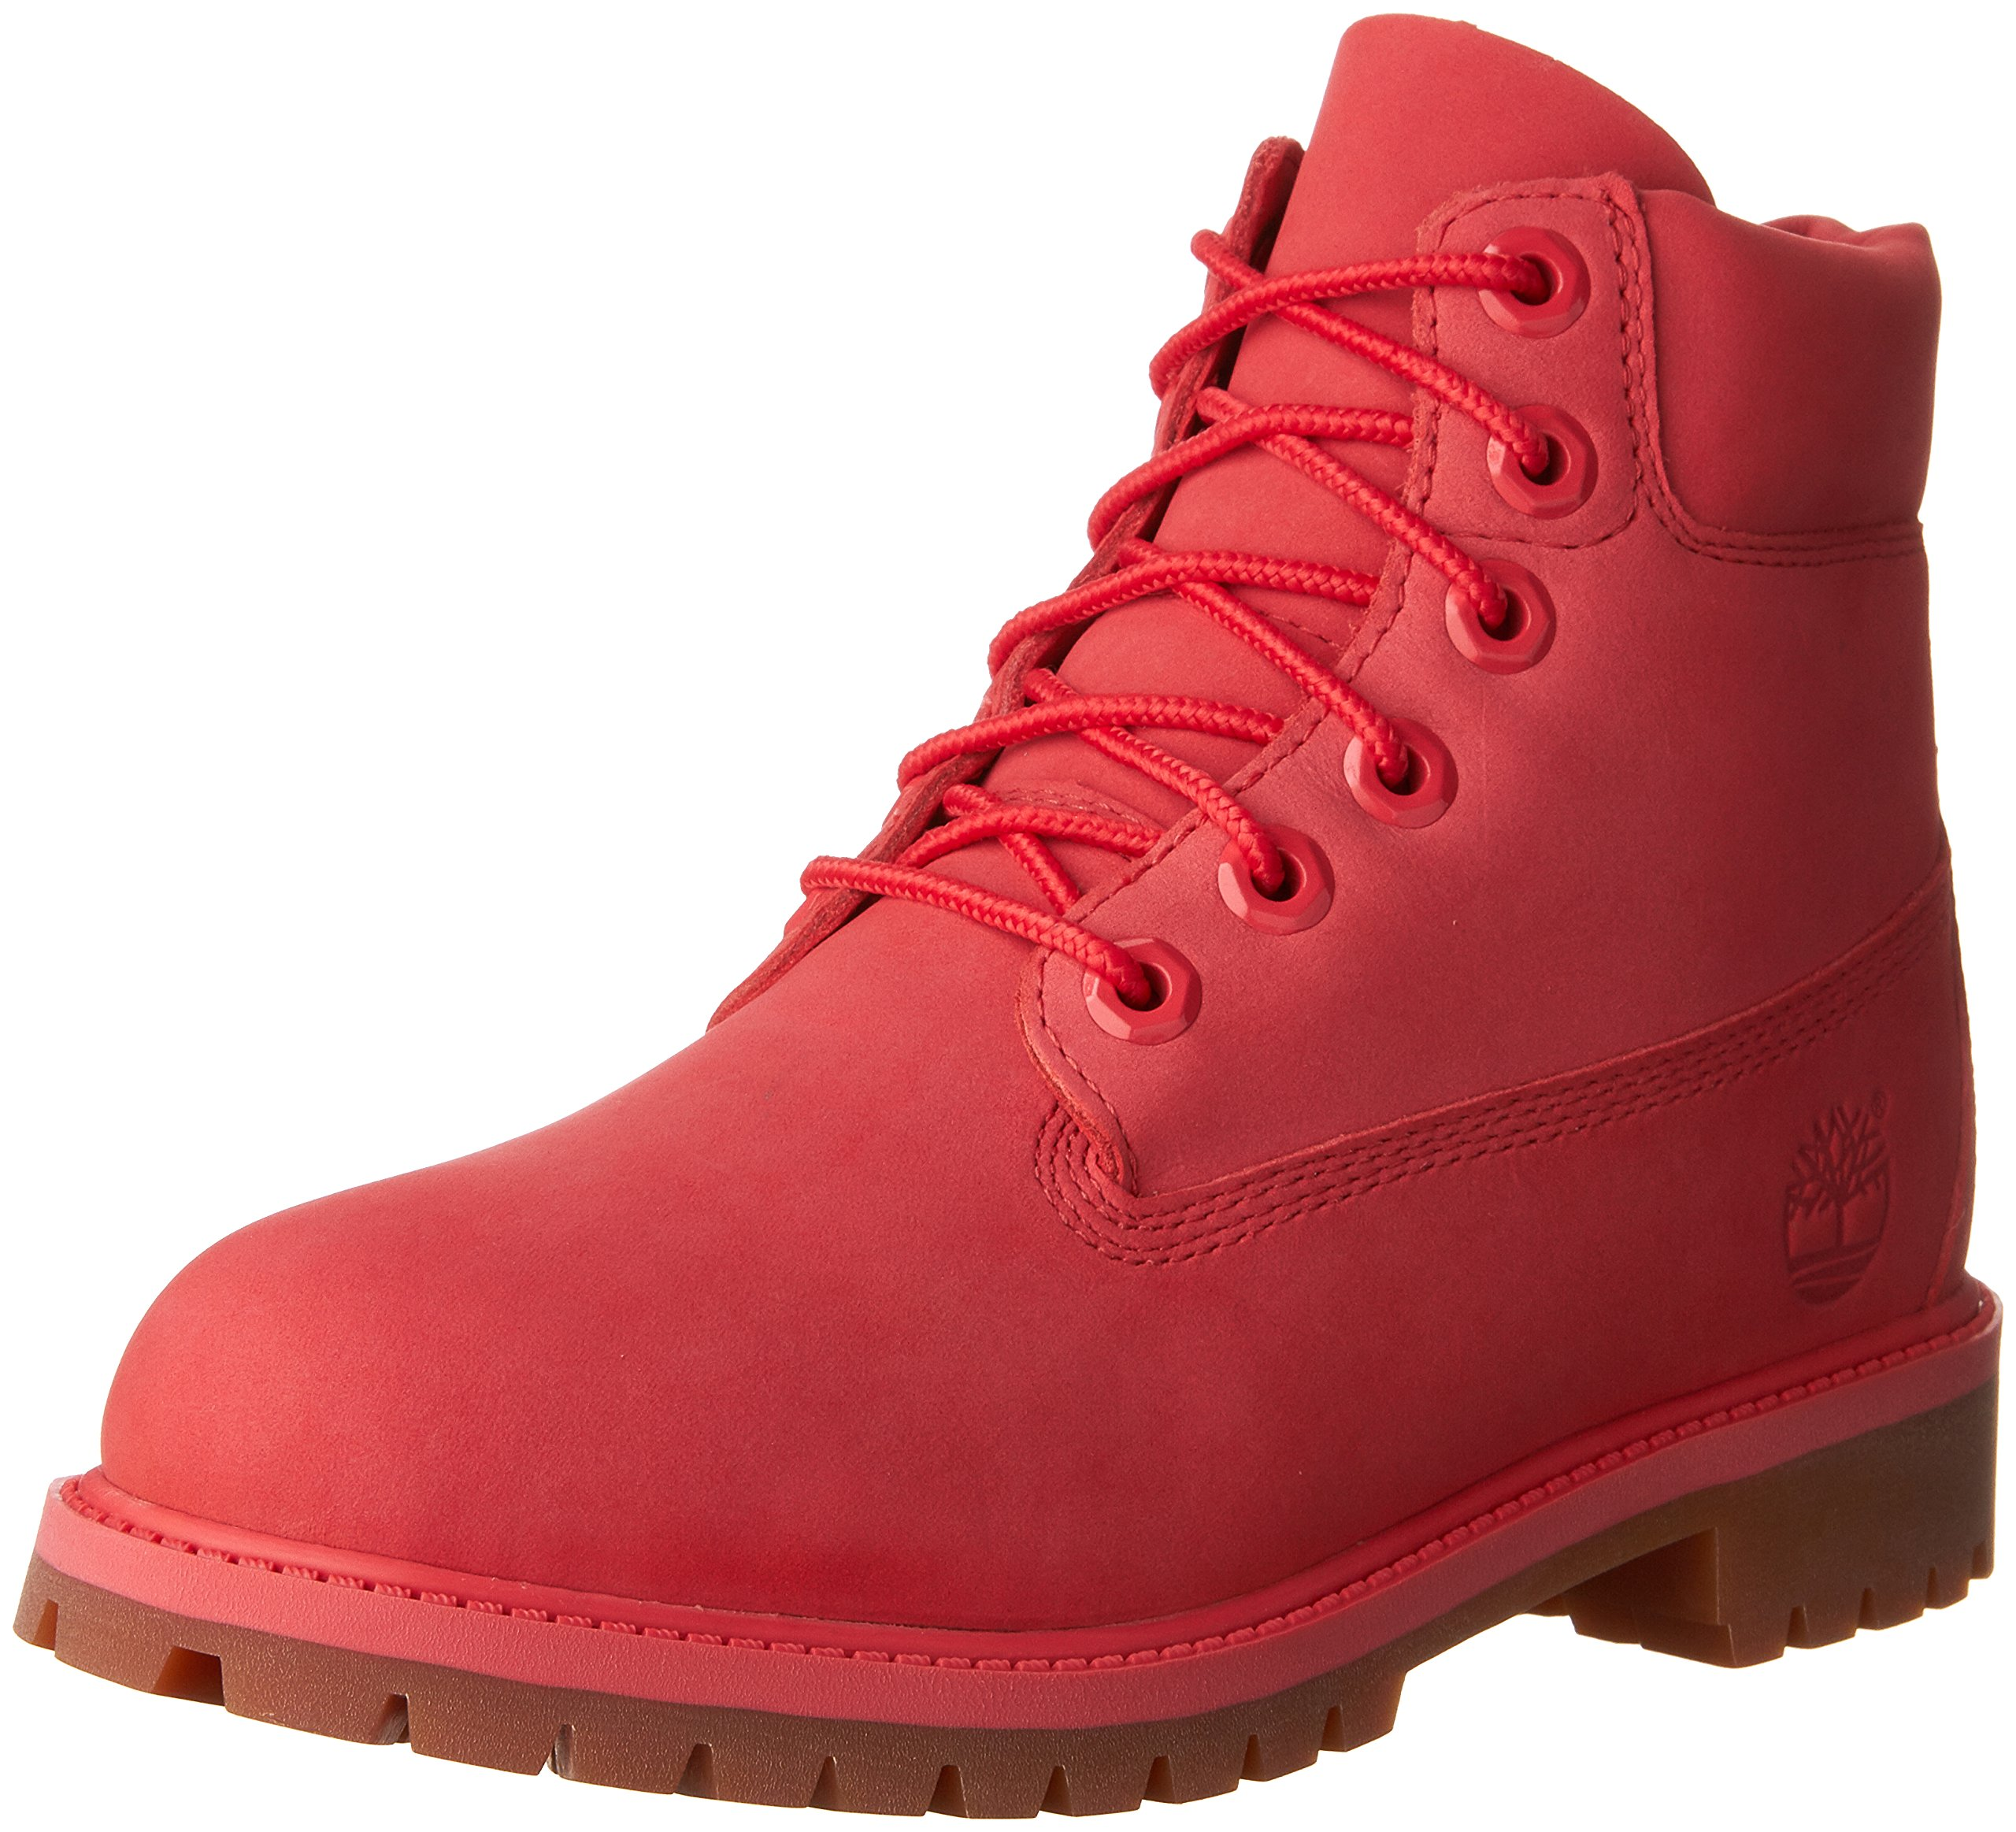 Timberland Kids Girl's 6'' Premium Waterproof Boot (Big Kid) Light Cardinal Waterbuck Boot